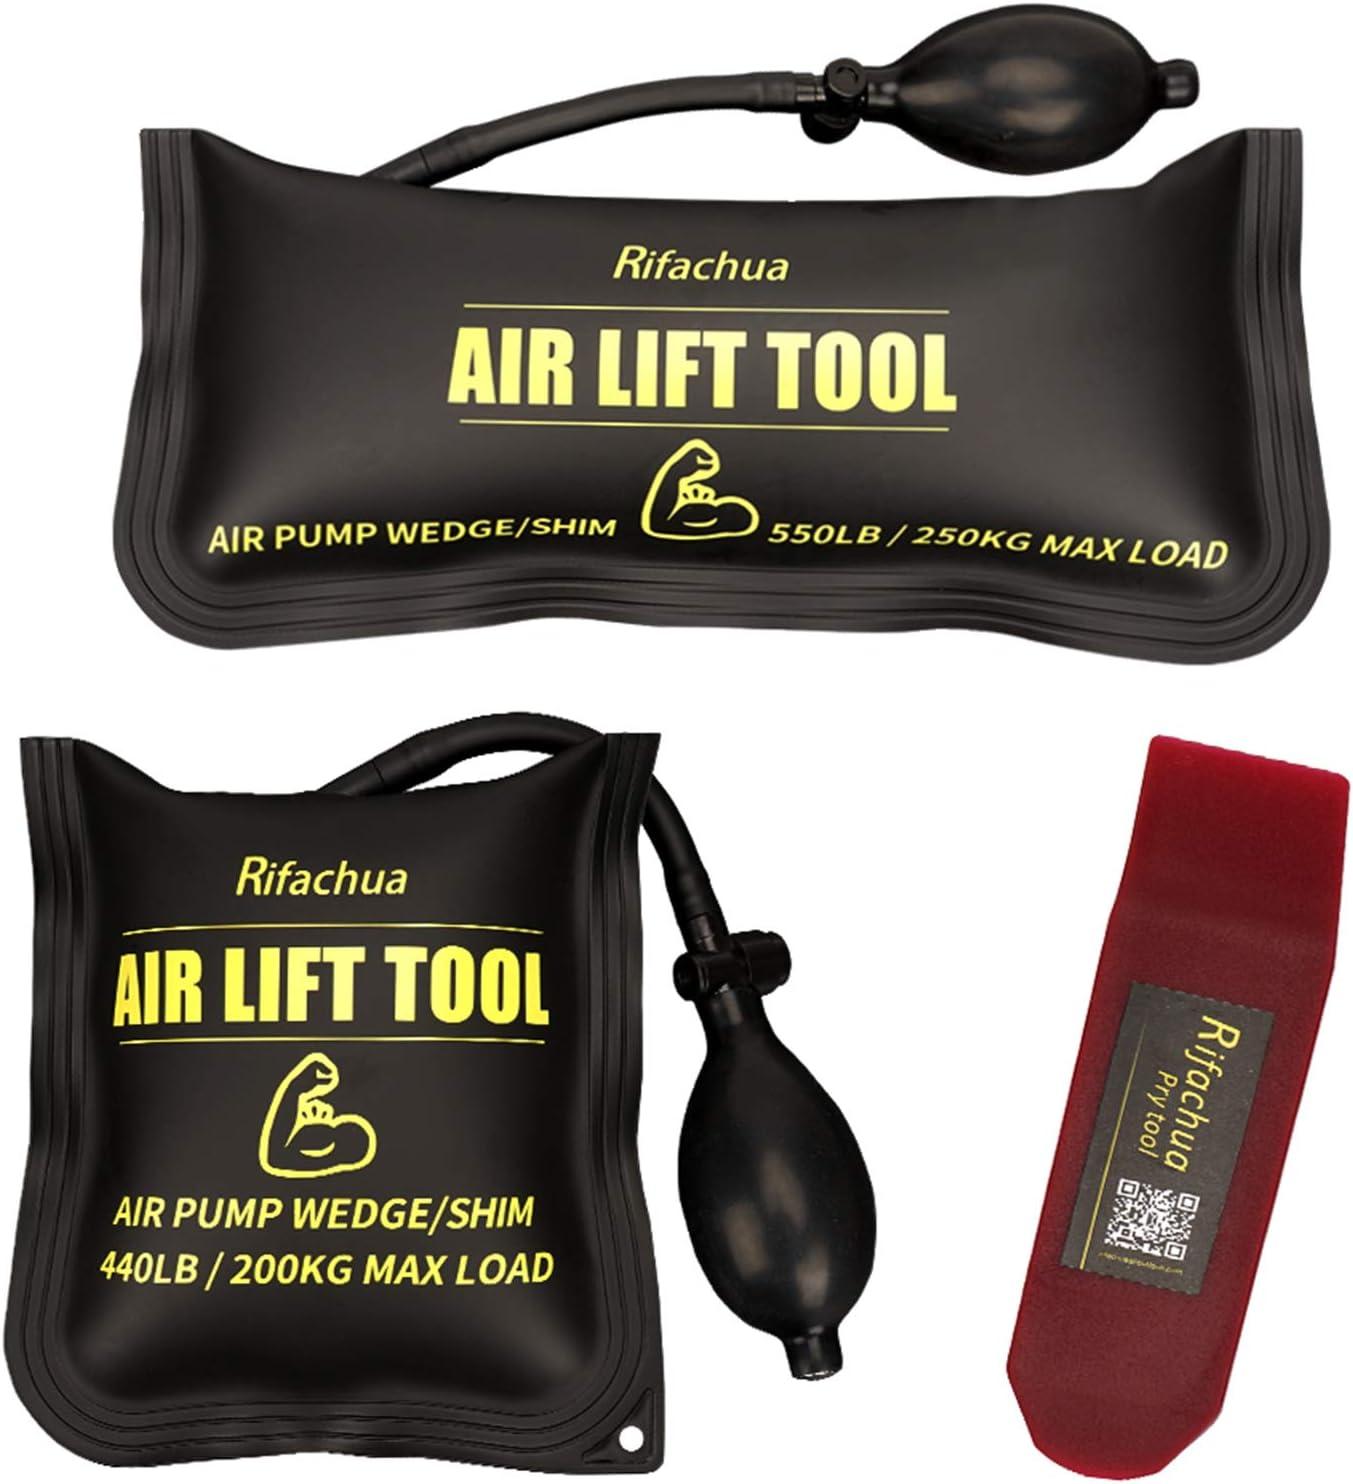 Rifachua Air Shim Air Wedge Bag 3 pcs Inflatable Air Bag Pump Wedge Kit Leveling Alignment Tool 550 LB and 440 LB Rating